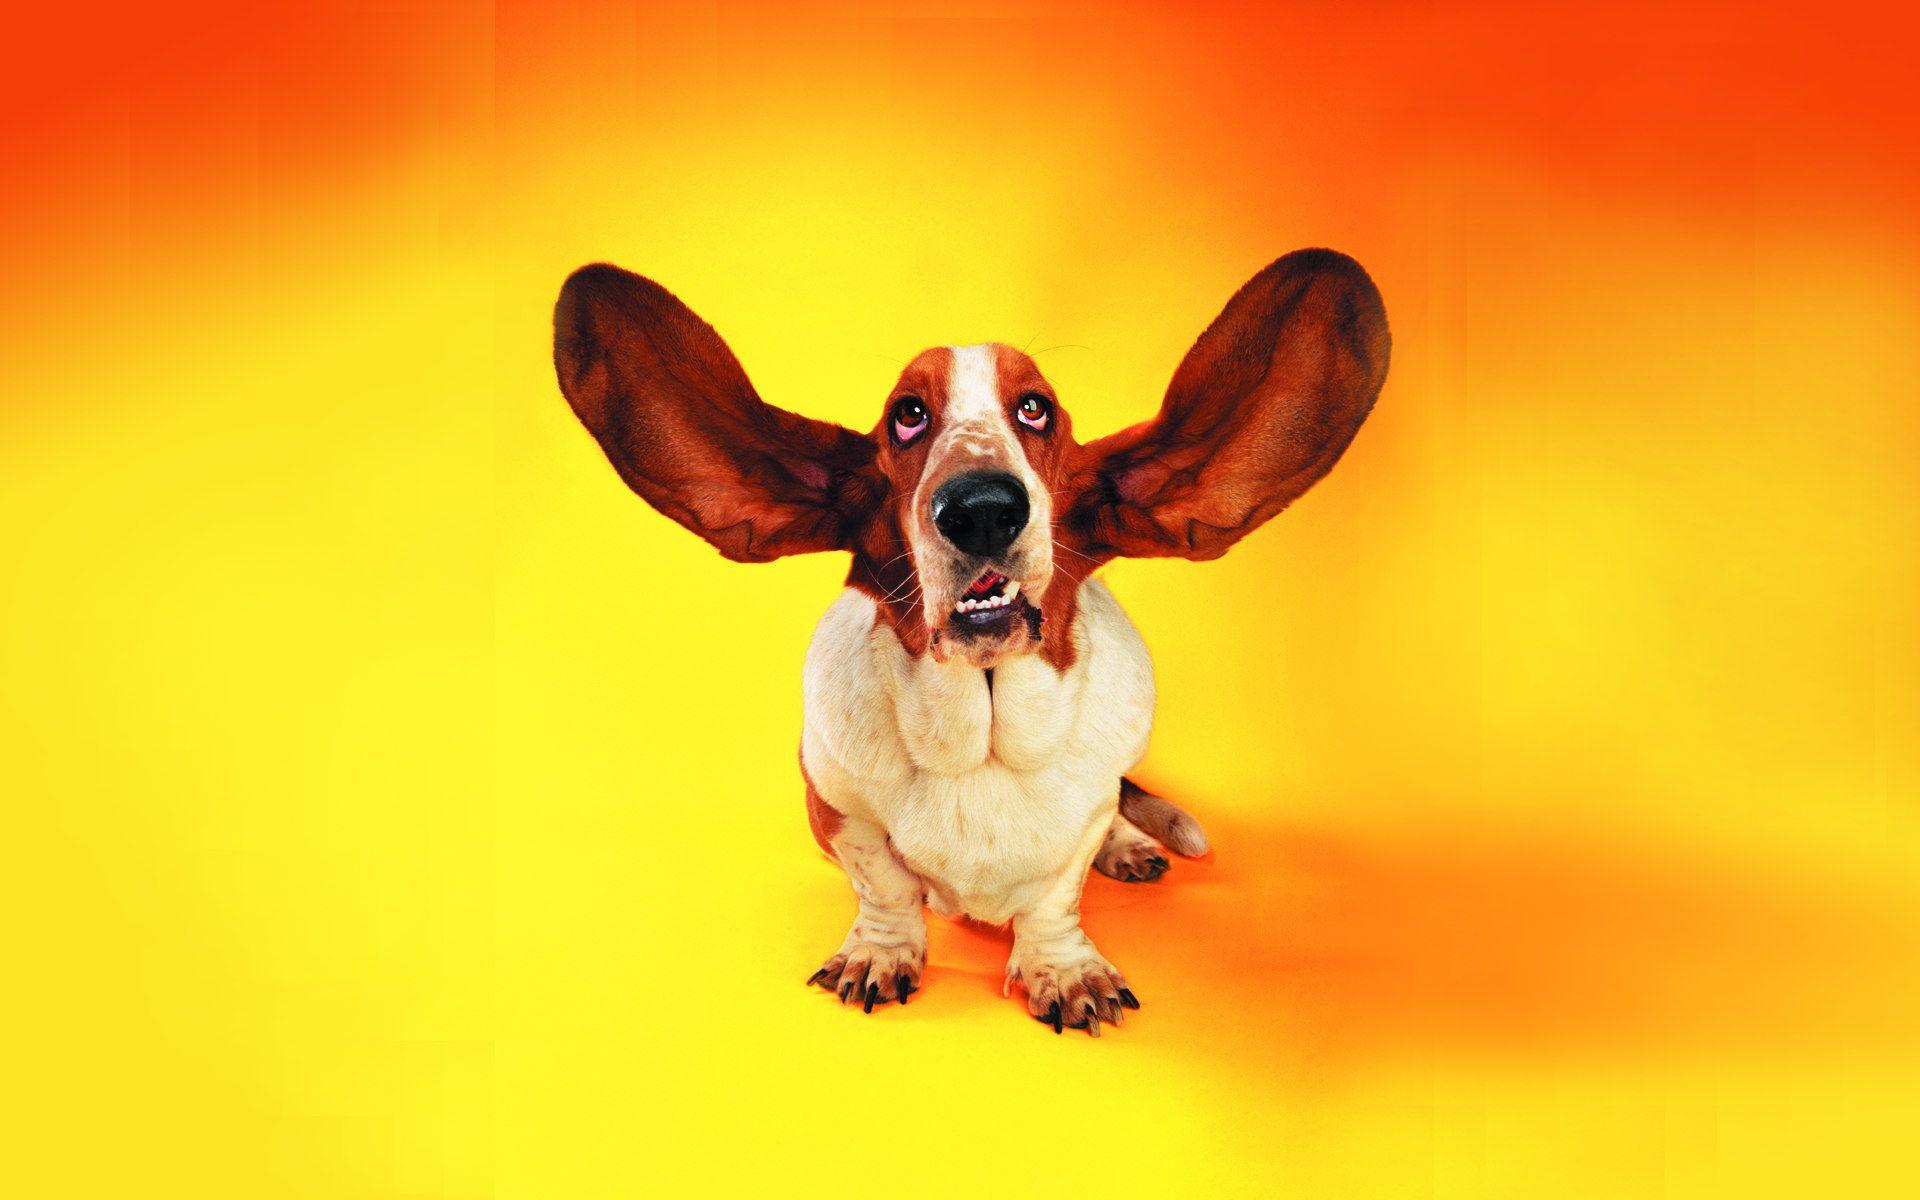 I AM LISTENING Cute Animal pics Funny dogs Dog 1920x1200